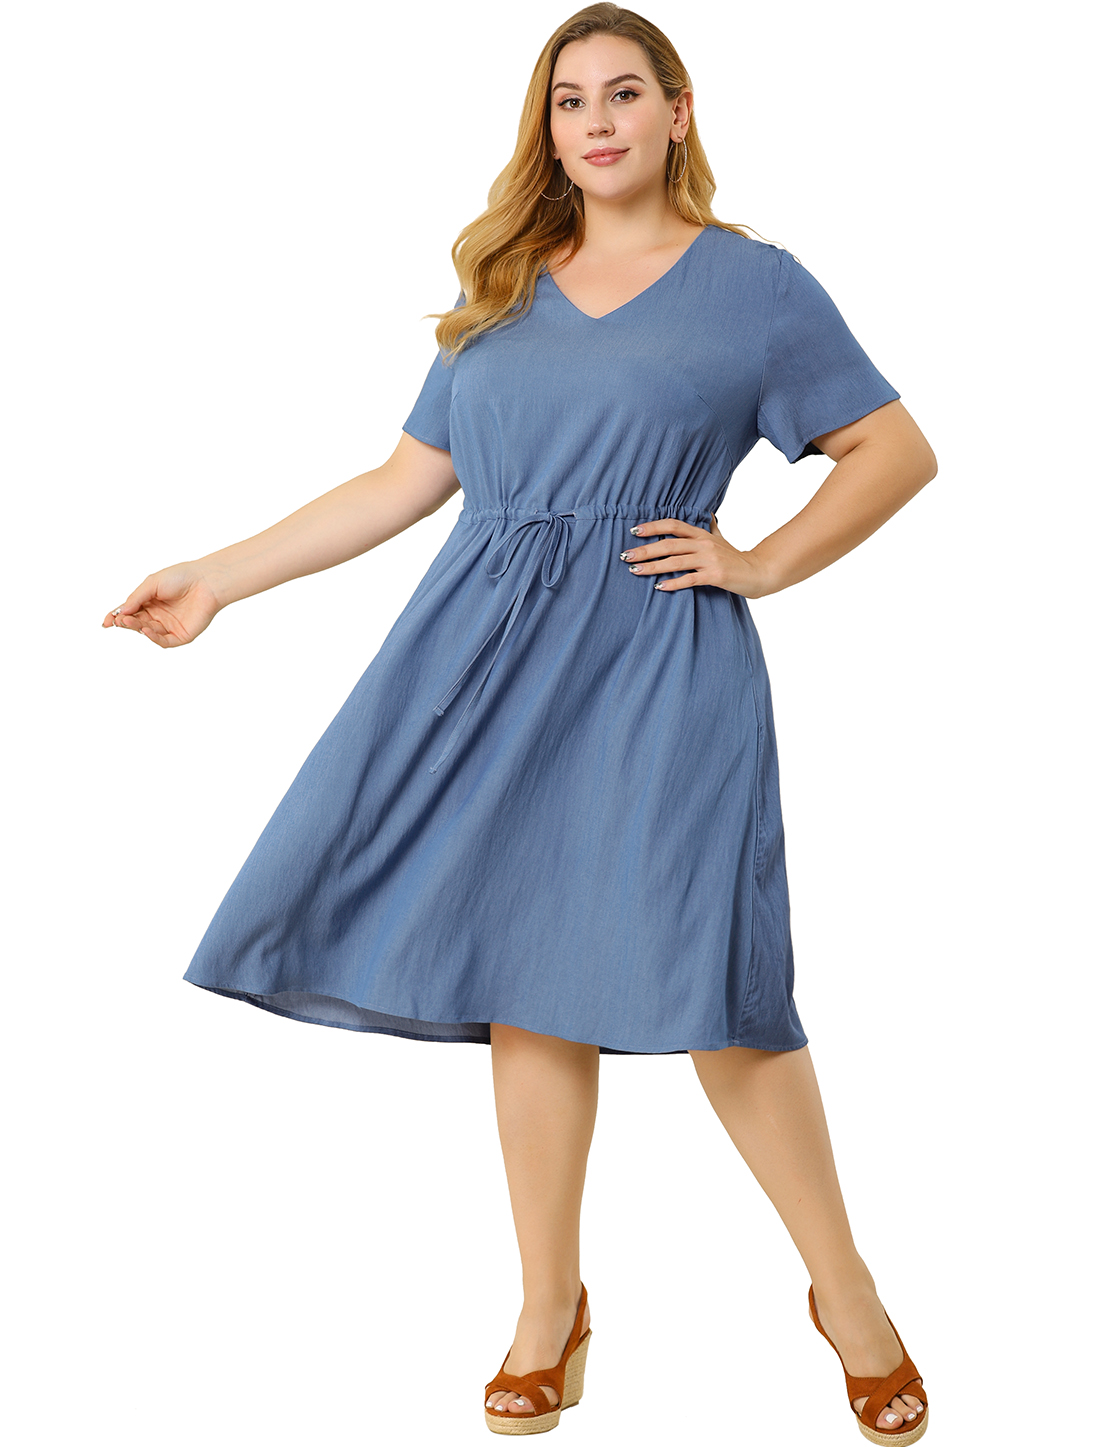 Women's Plus Size V Neck Short Sleeve Chambray Denim Dresses Blue 4X